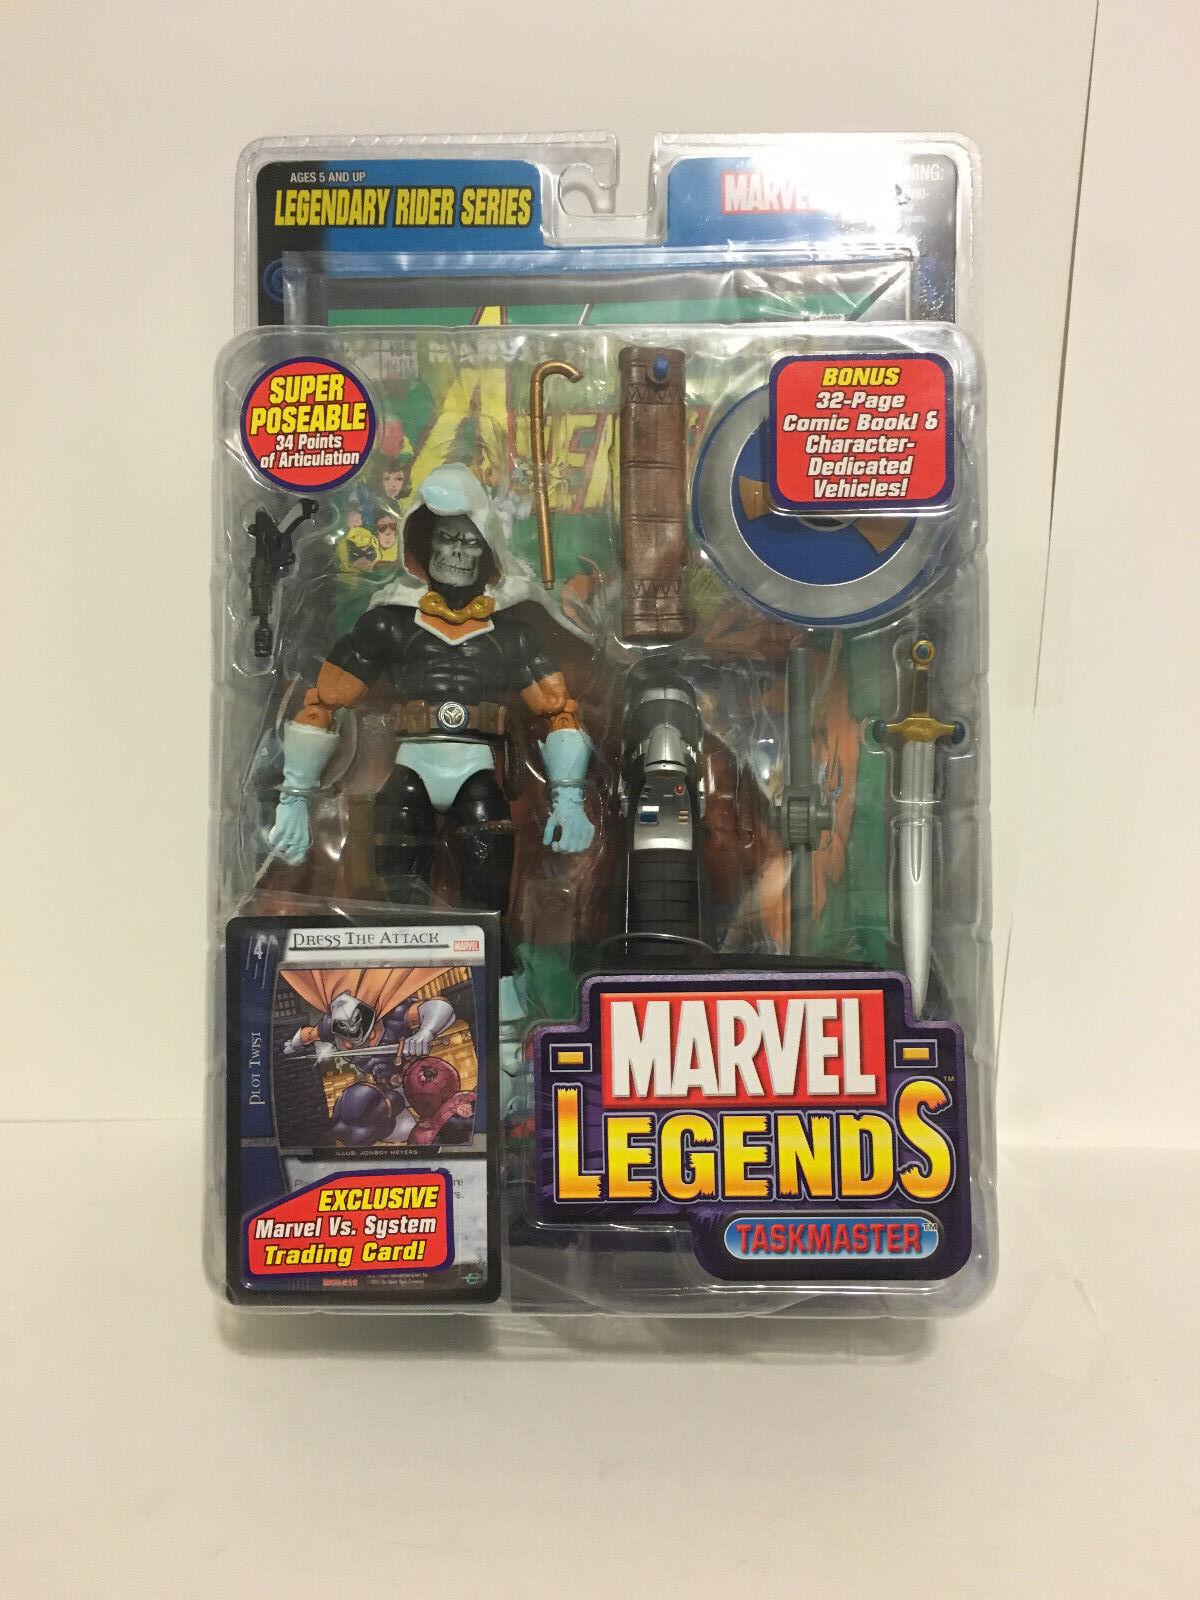 Toy Biz Marvel Legends TASKMASTER Legendary Rider Series Unopened